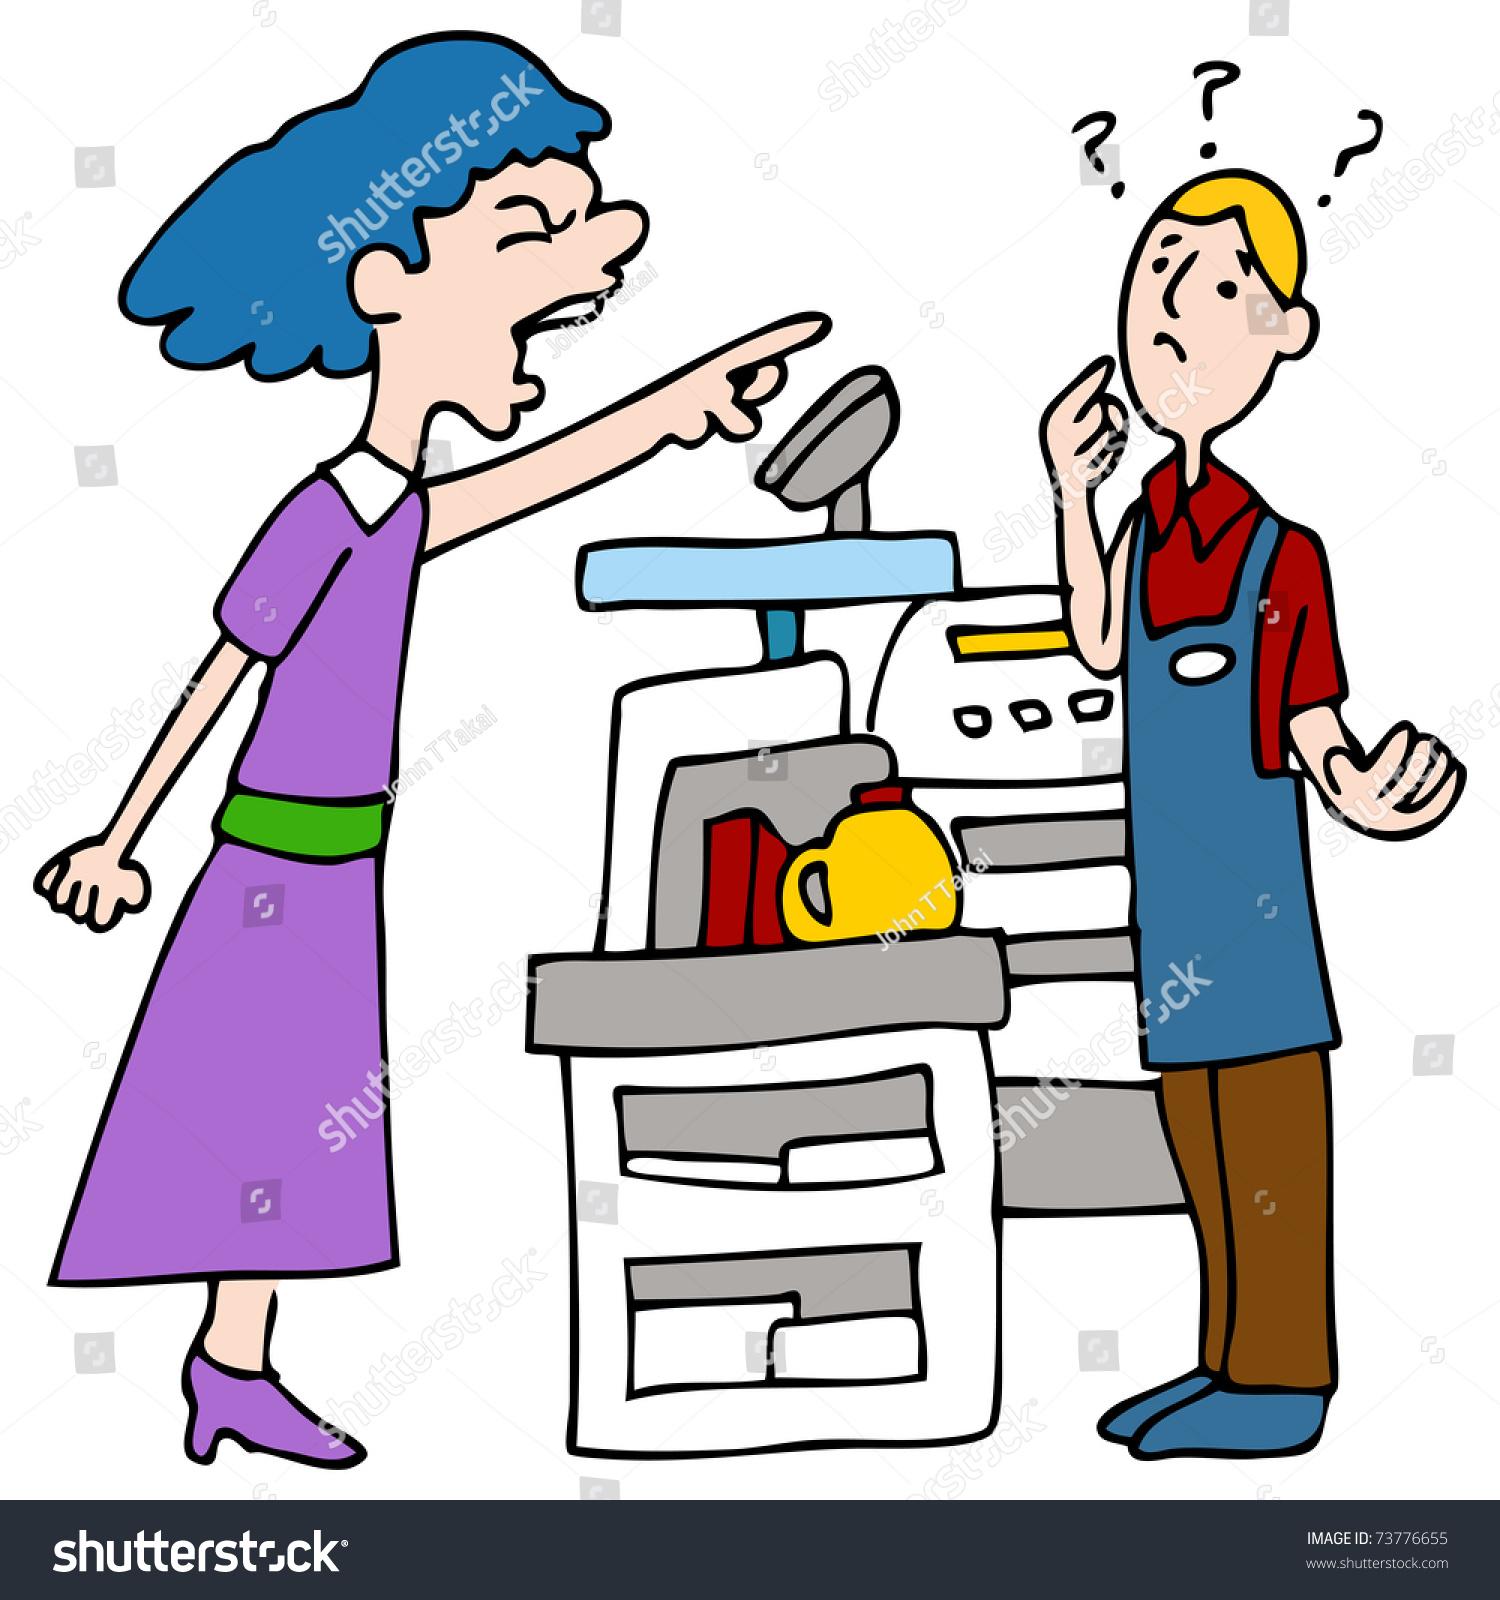 Cashier Cartoons: Image Customer Yelling Cashier Stock Vector 73776655